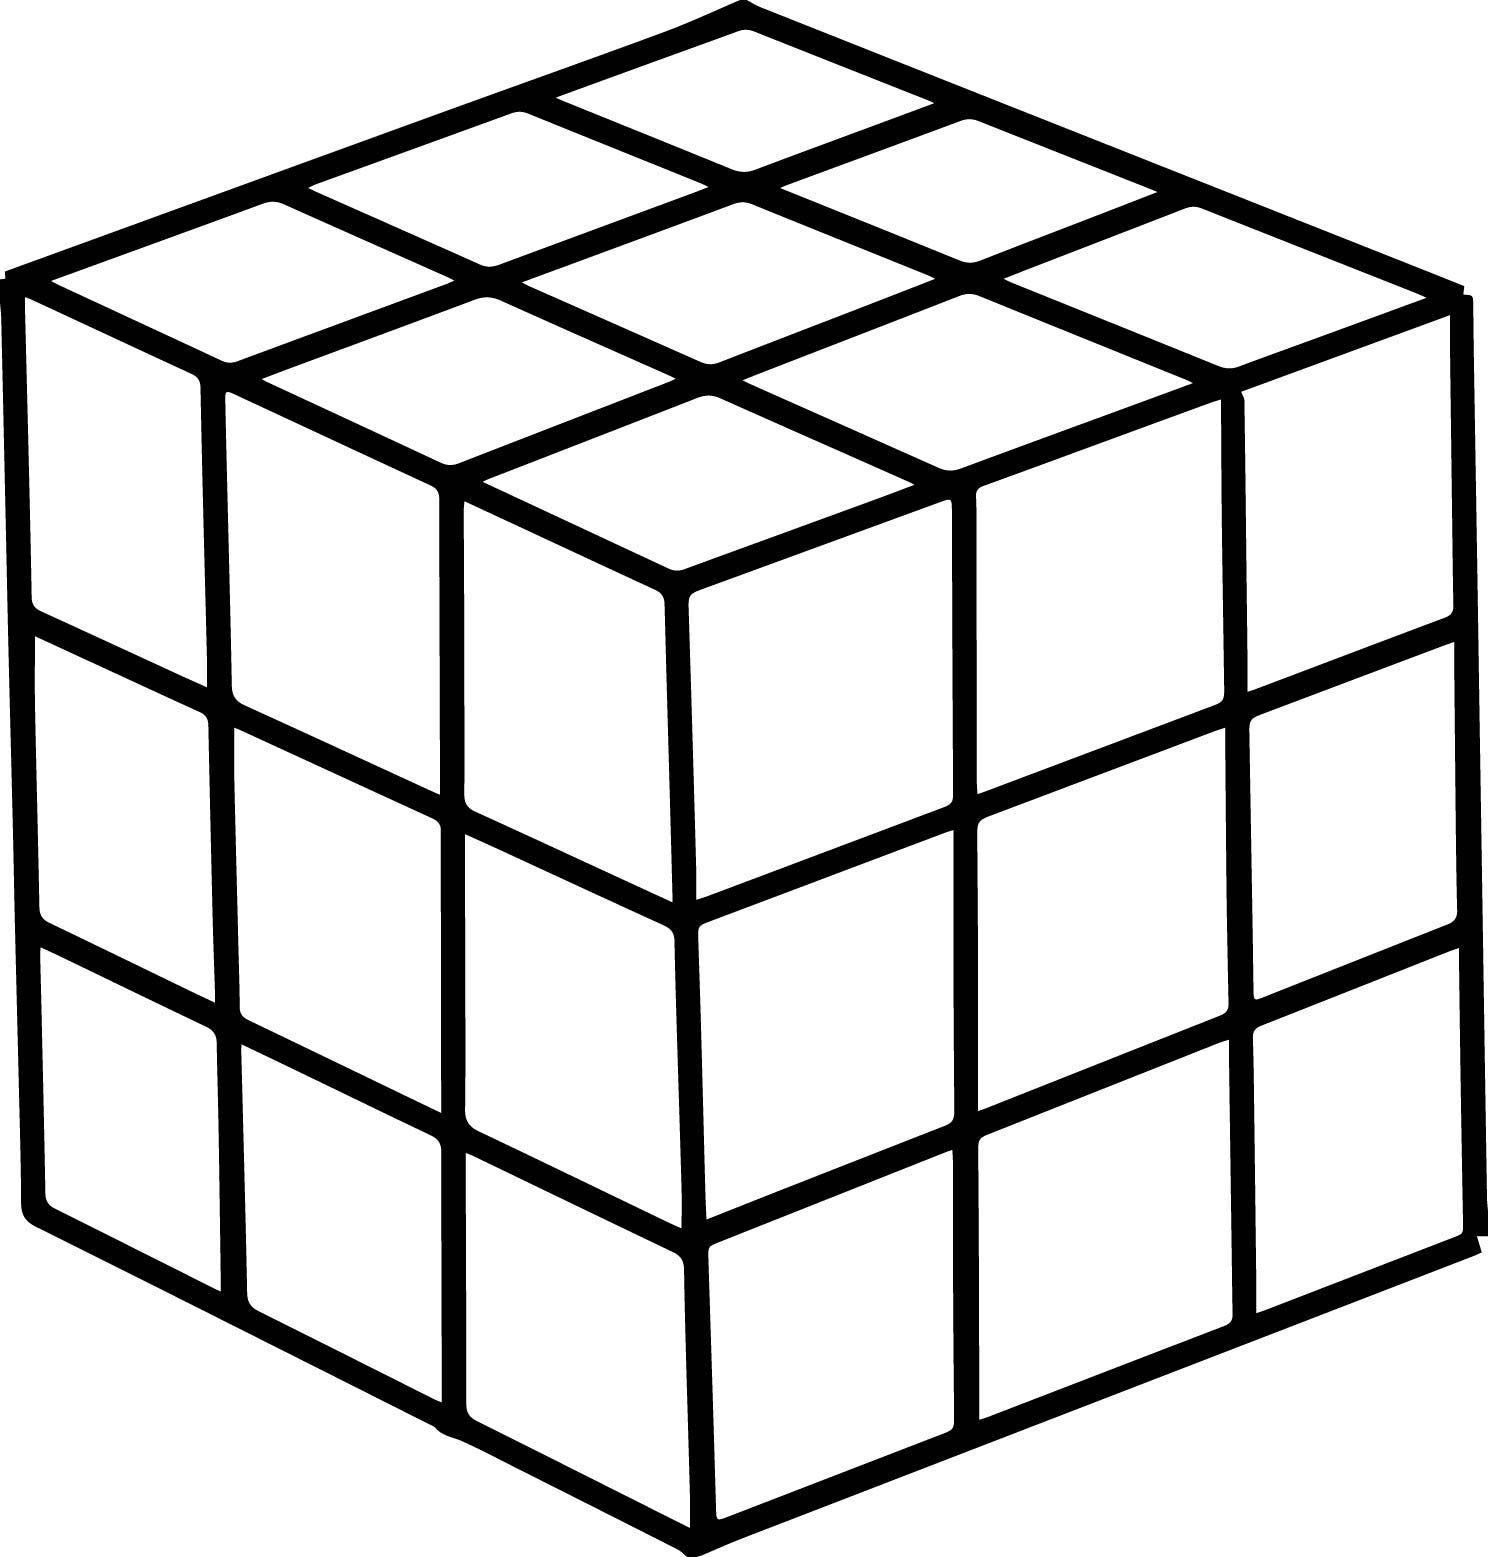 80s Puzzle Box Coloring Page | Wecoloringpage | Cave quest ...